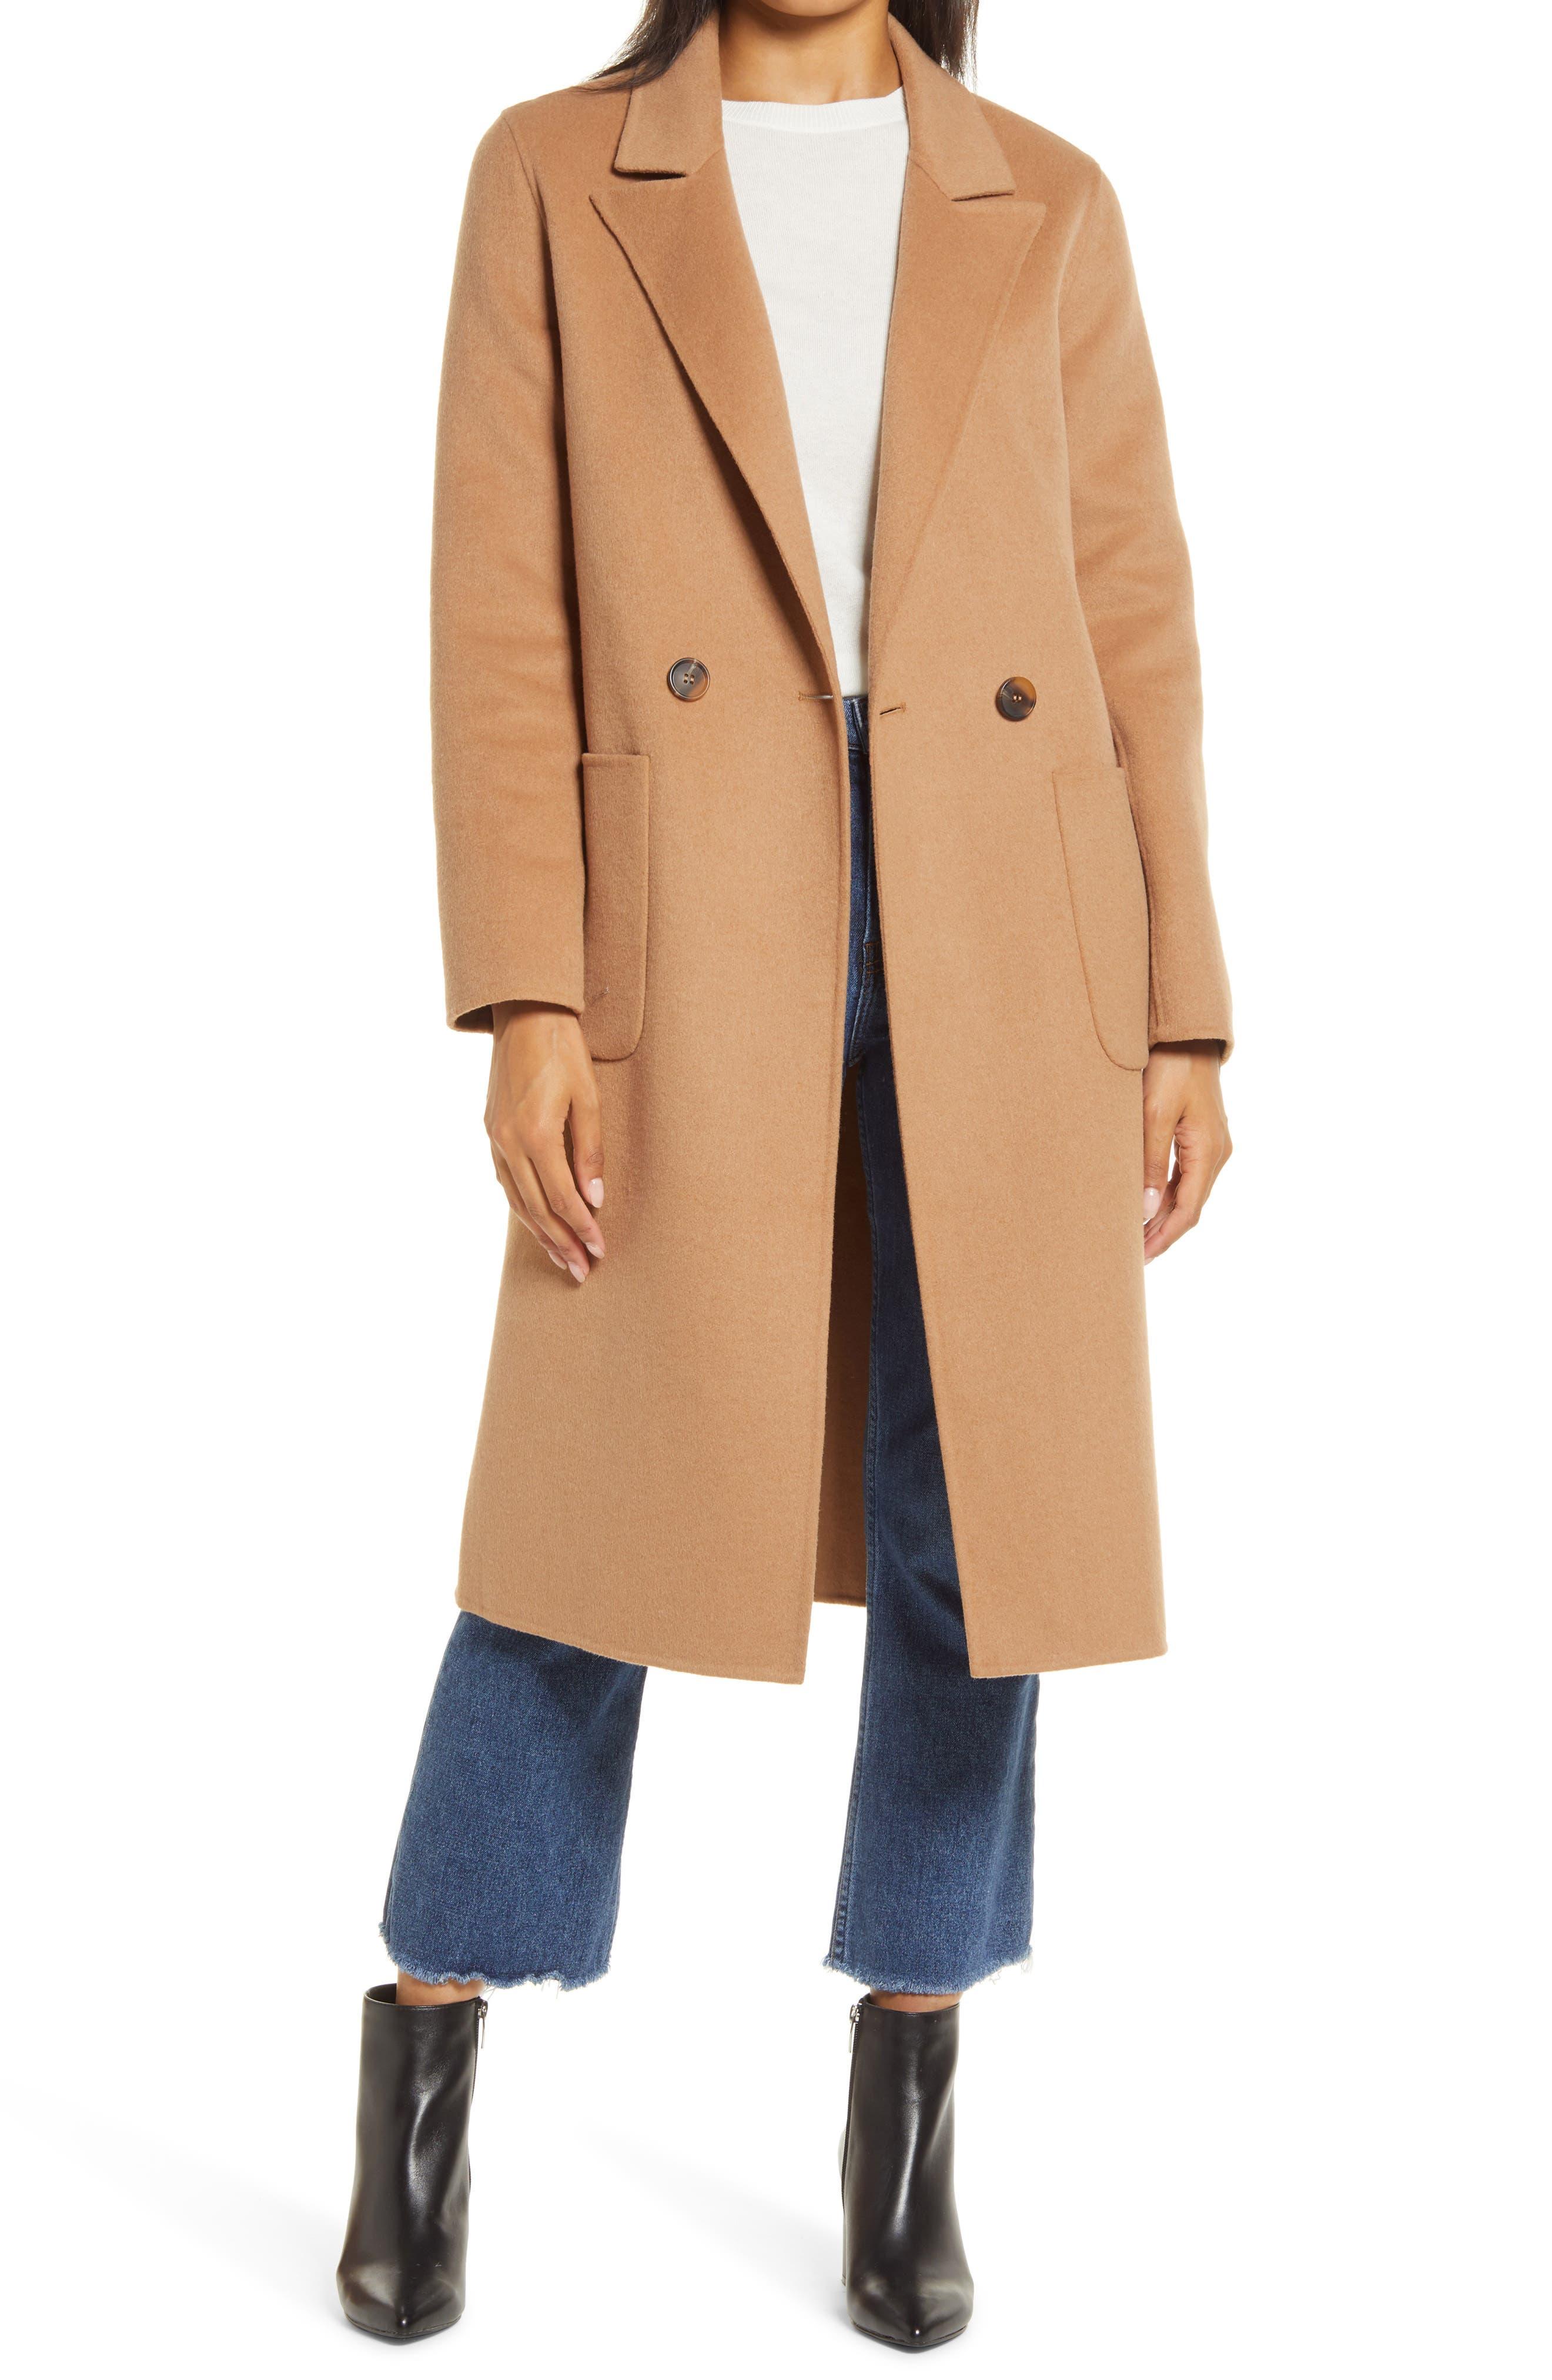 1920s Coats, Flapper Coats, 20s Jackets Womens Halogen Double Face Wool Coat $149.90 AT vintagedancer.com